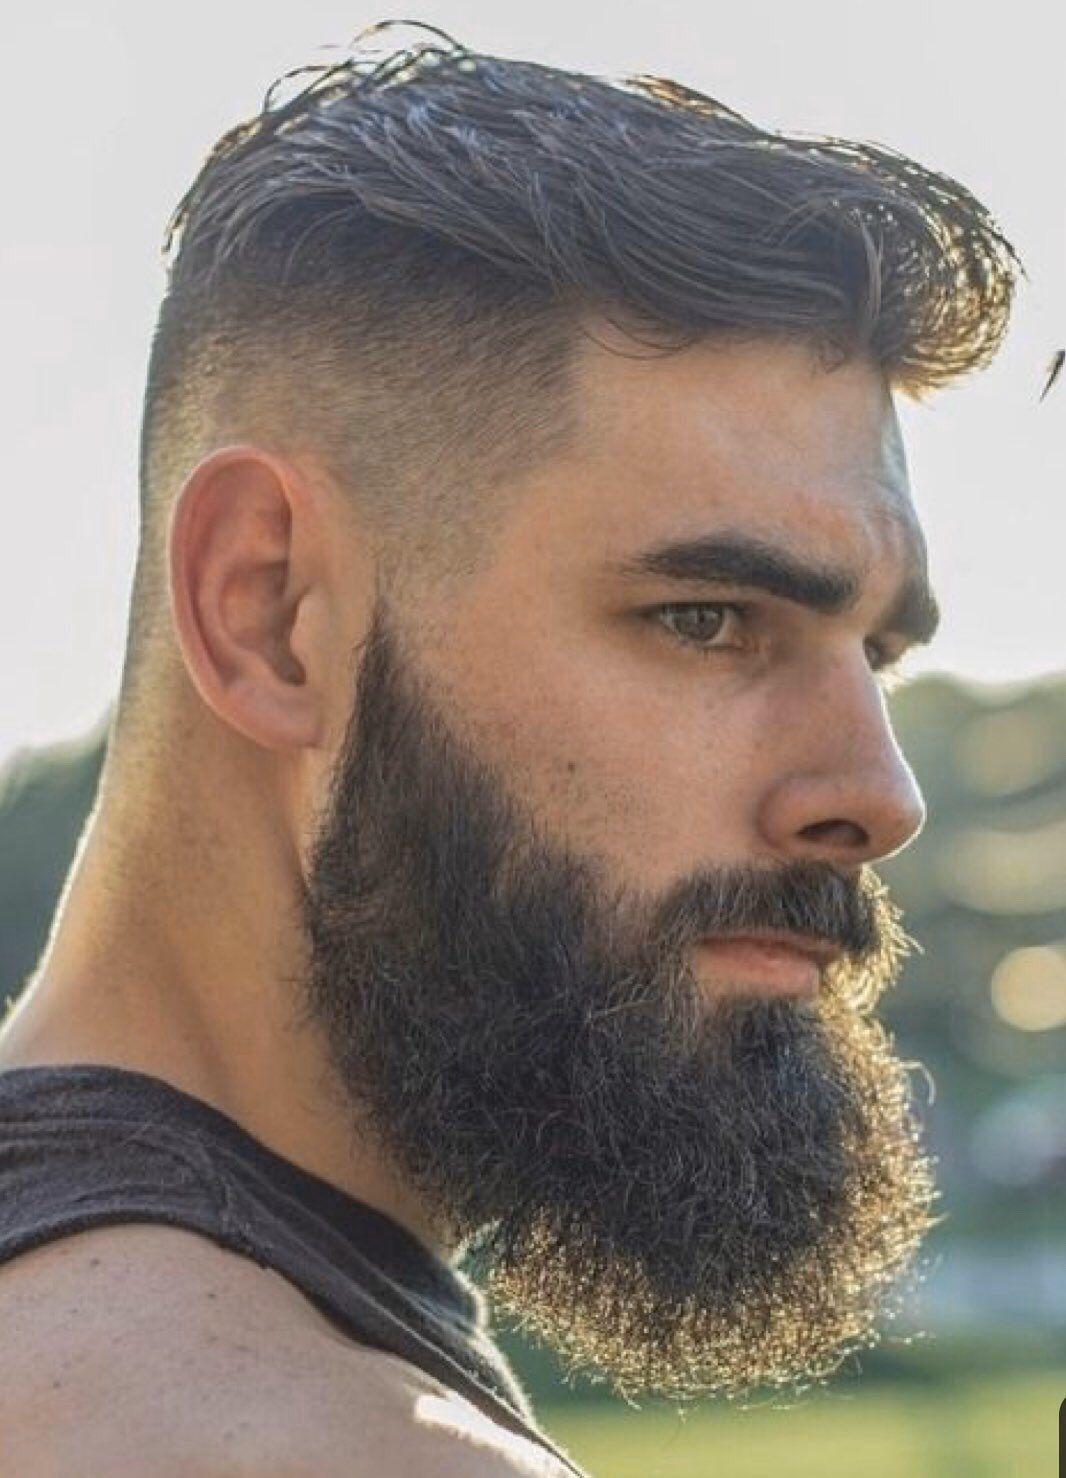 Pin By Victor Ramirez On Beard Beard Hairstyle Beard Life Beard No Mustache